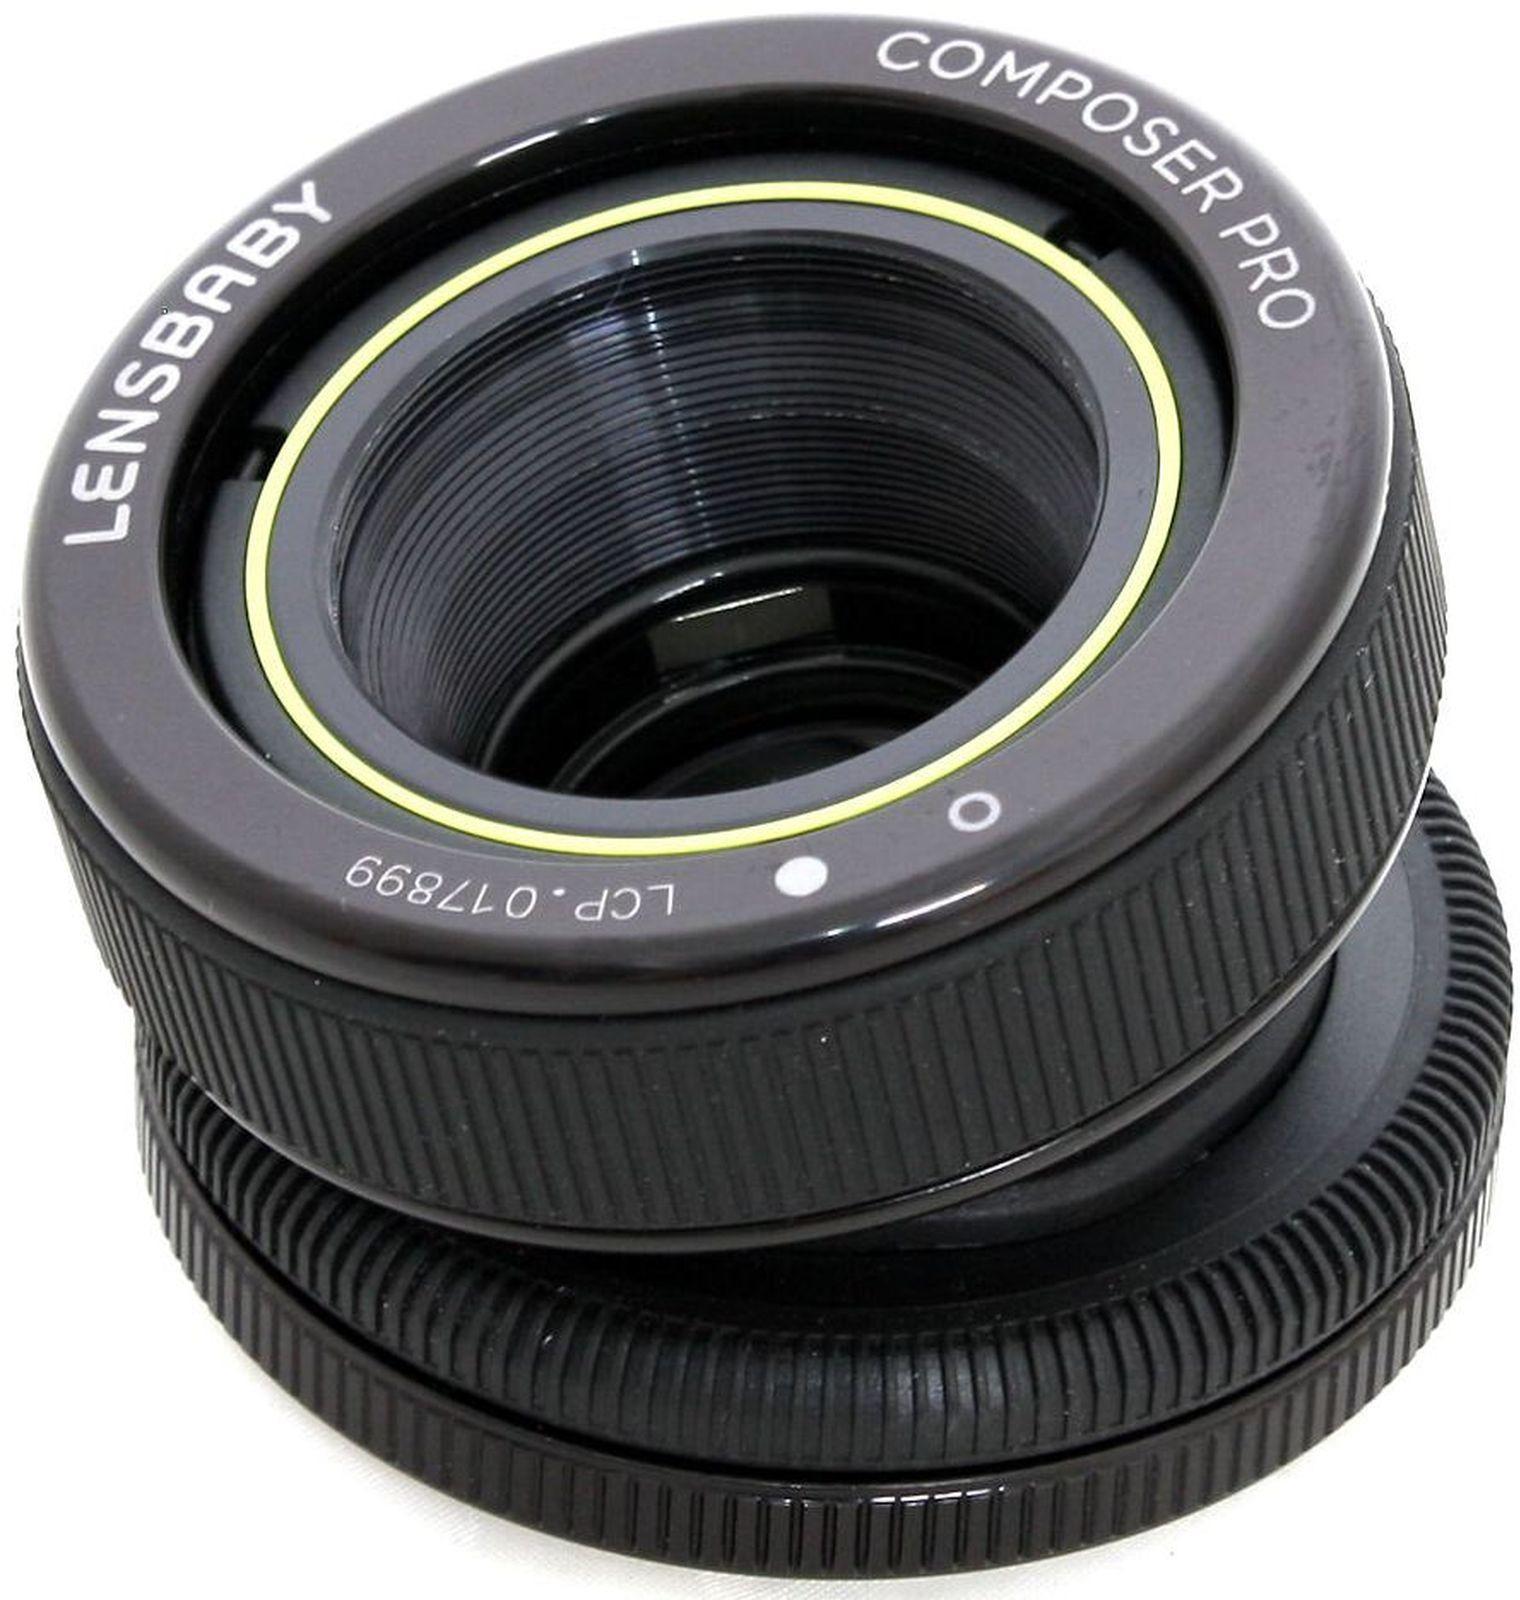 Объектив Lensbaby Composer Pro Double Glass 50mm f/4.0 для Pentax, черный